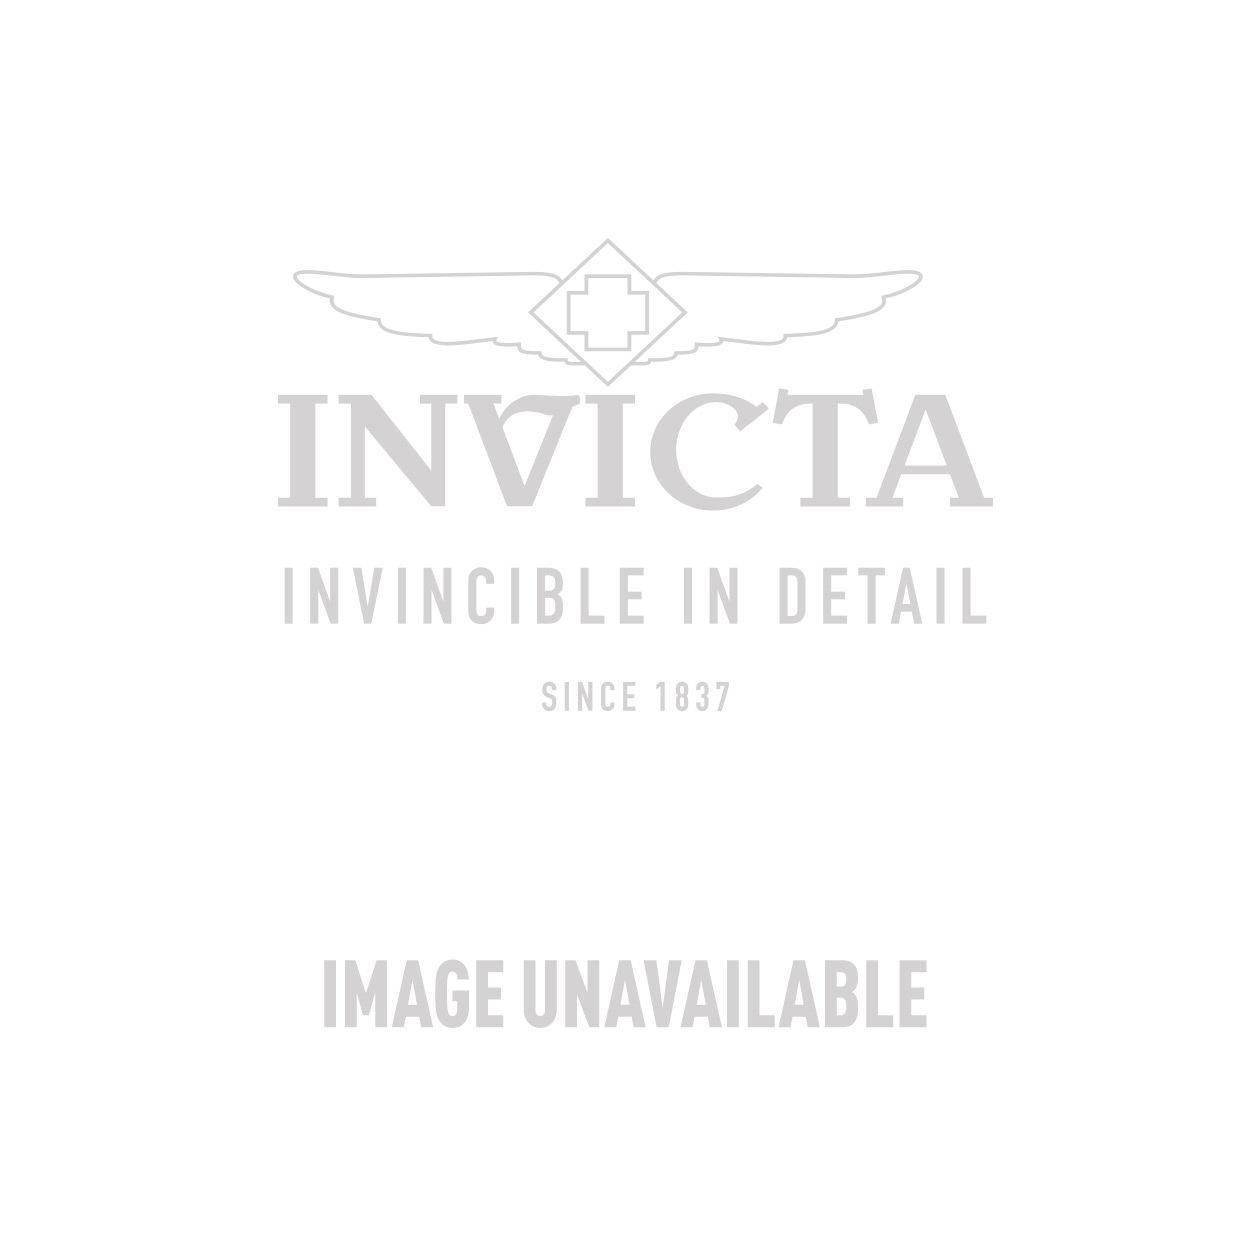 Invicta Coalition Forces Mens Quartz 50 mm Rainbow Case Rainbow Dial - Model 27261